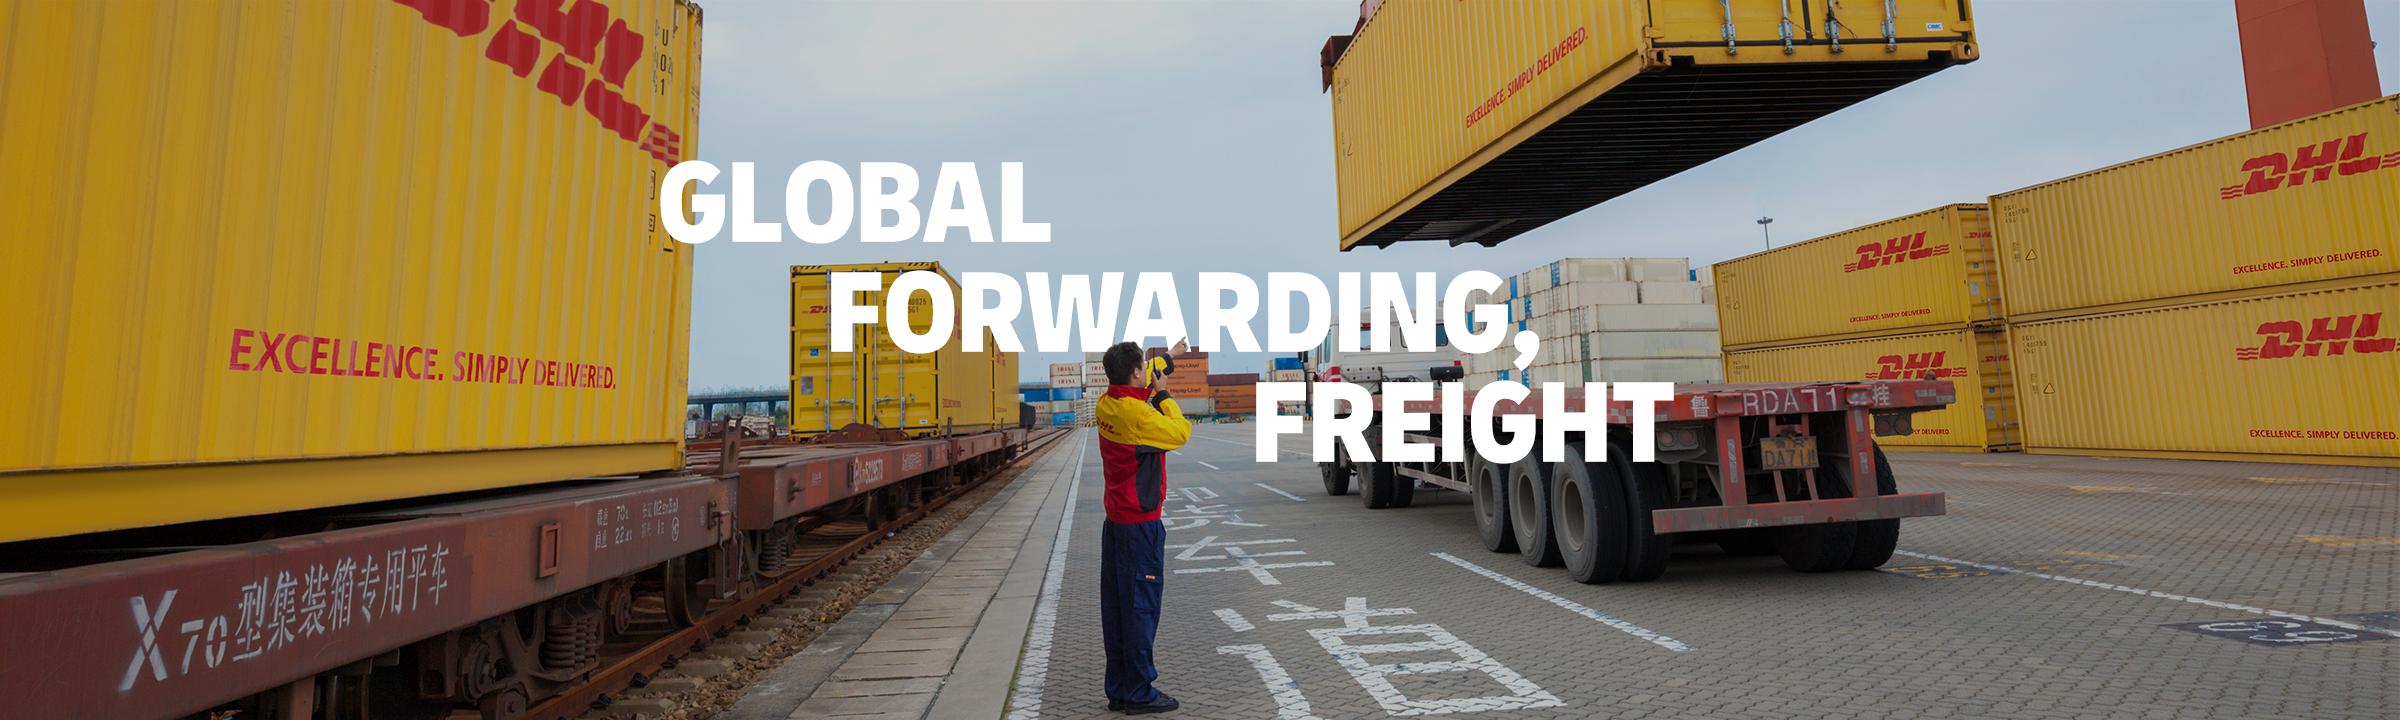 Global Forwarding, Freight